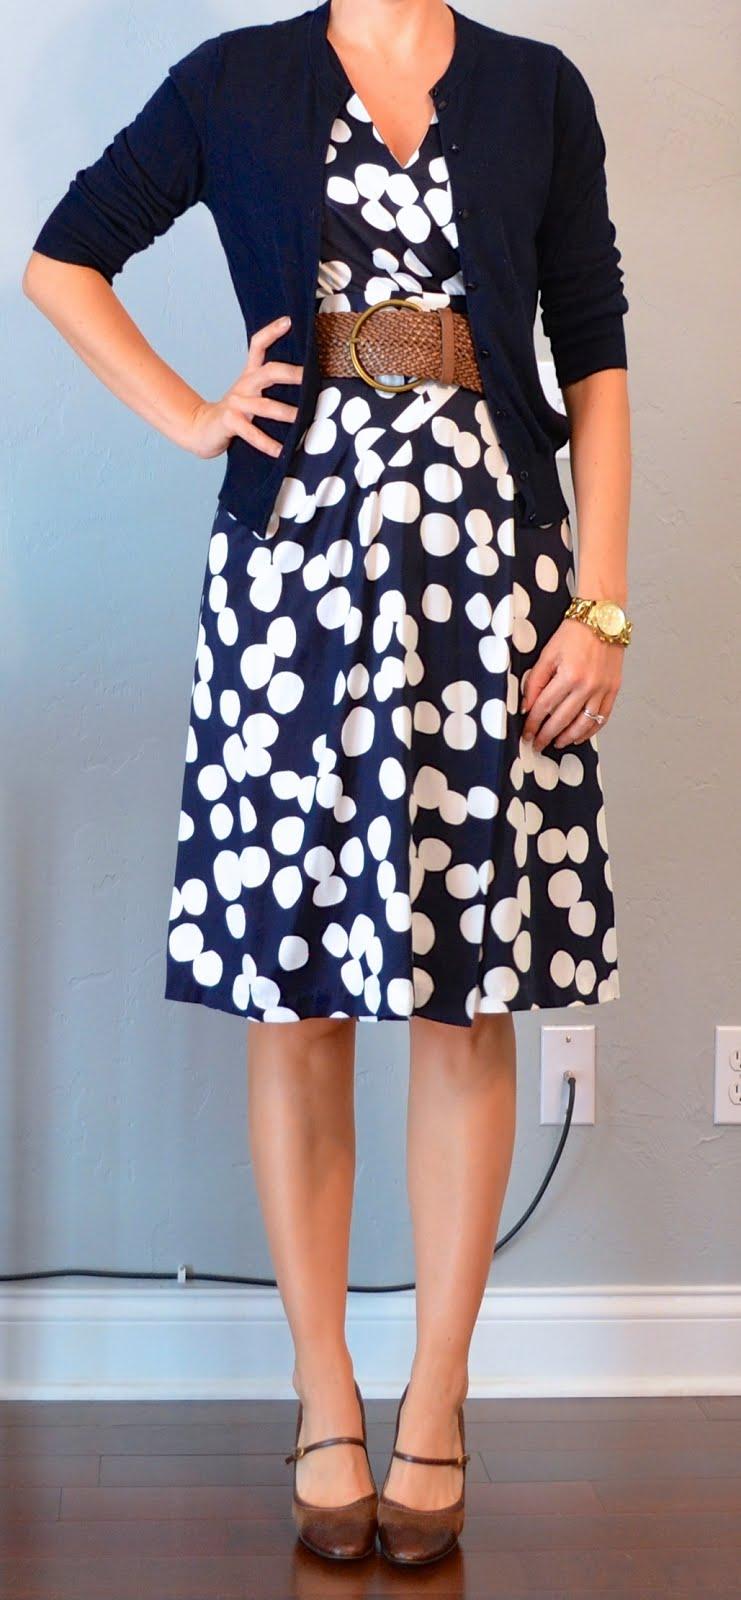 outfit post: navy aline skirt, polkadot blouse, mustard